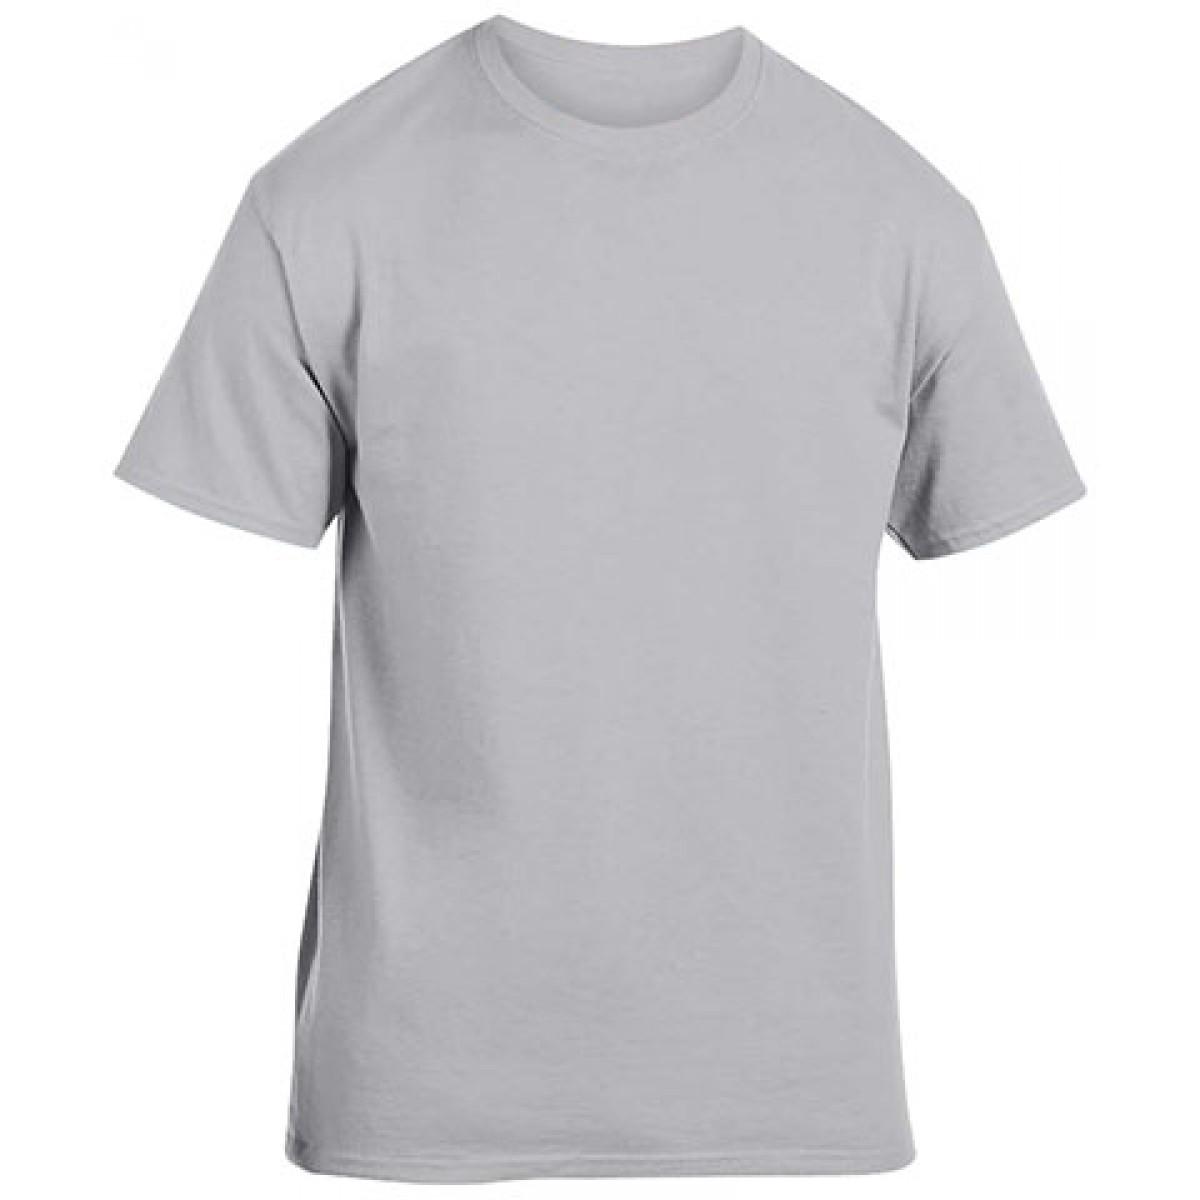 Cotton Short Sleeve T-Shirt-Gray-YL